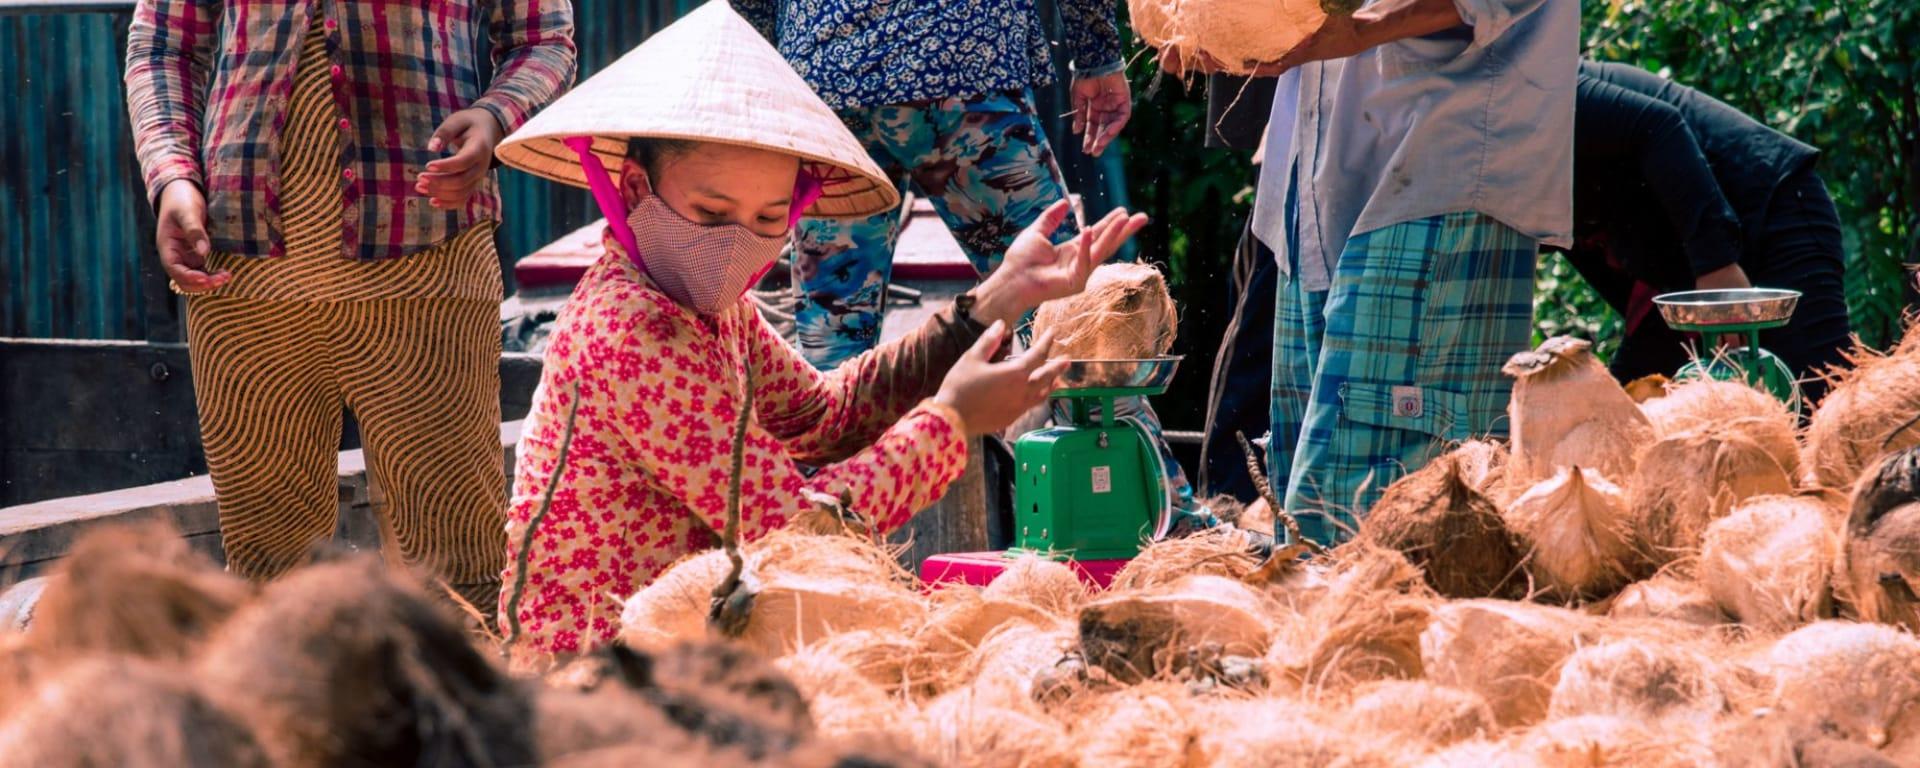 Mekong Delta mit Mango Cruise in Saigon: Mekong Delta coconut farm